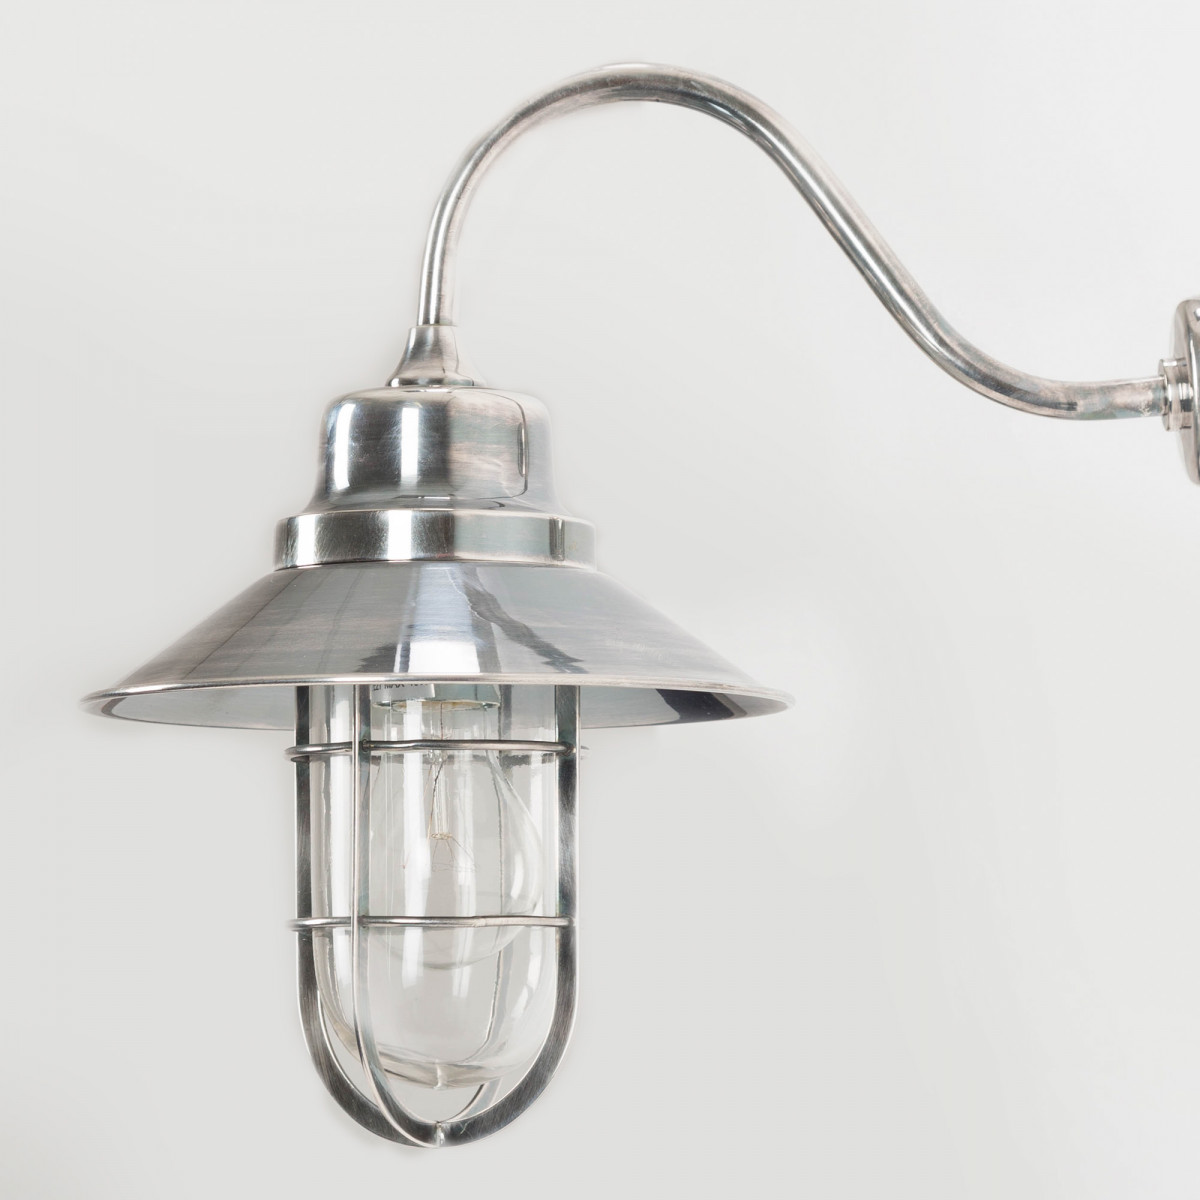 Nostaluce Vermont Vintage Stallamp antiek zilver